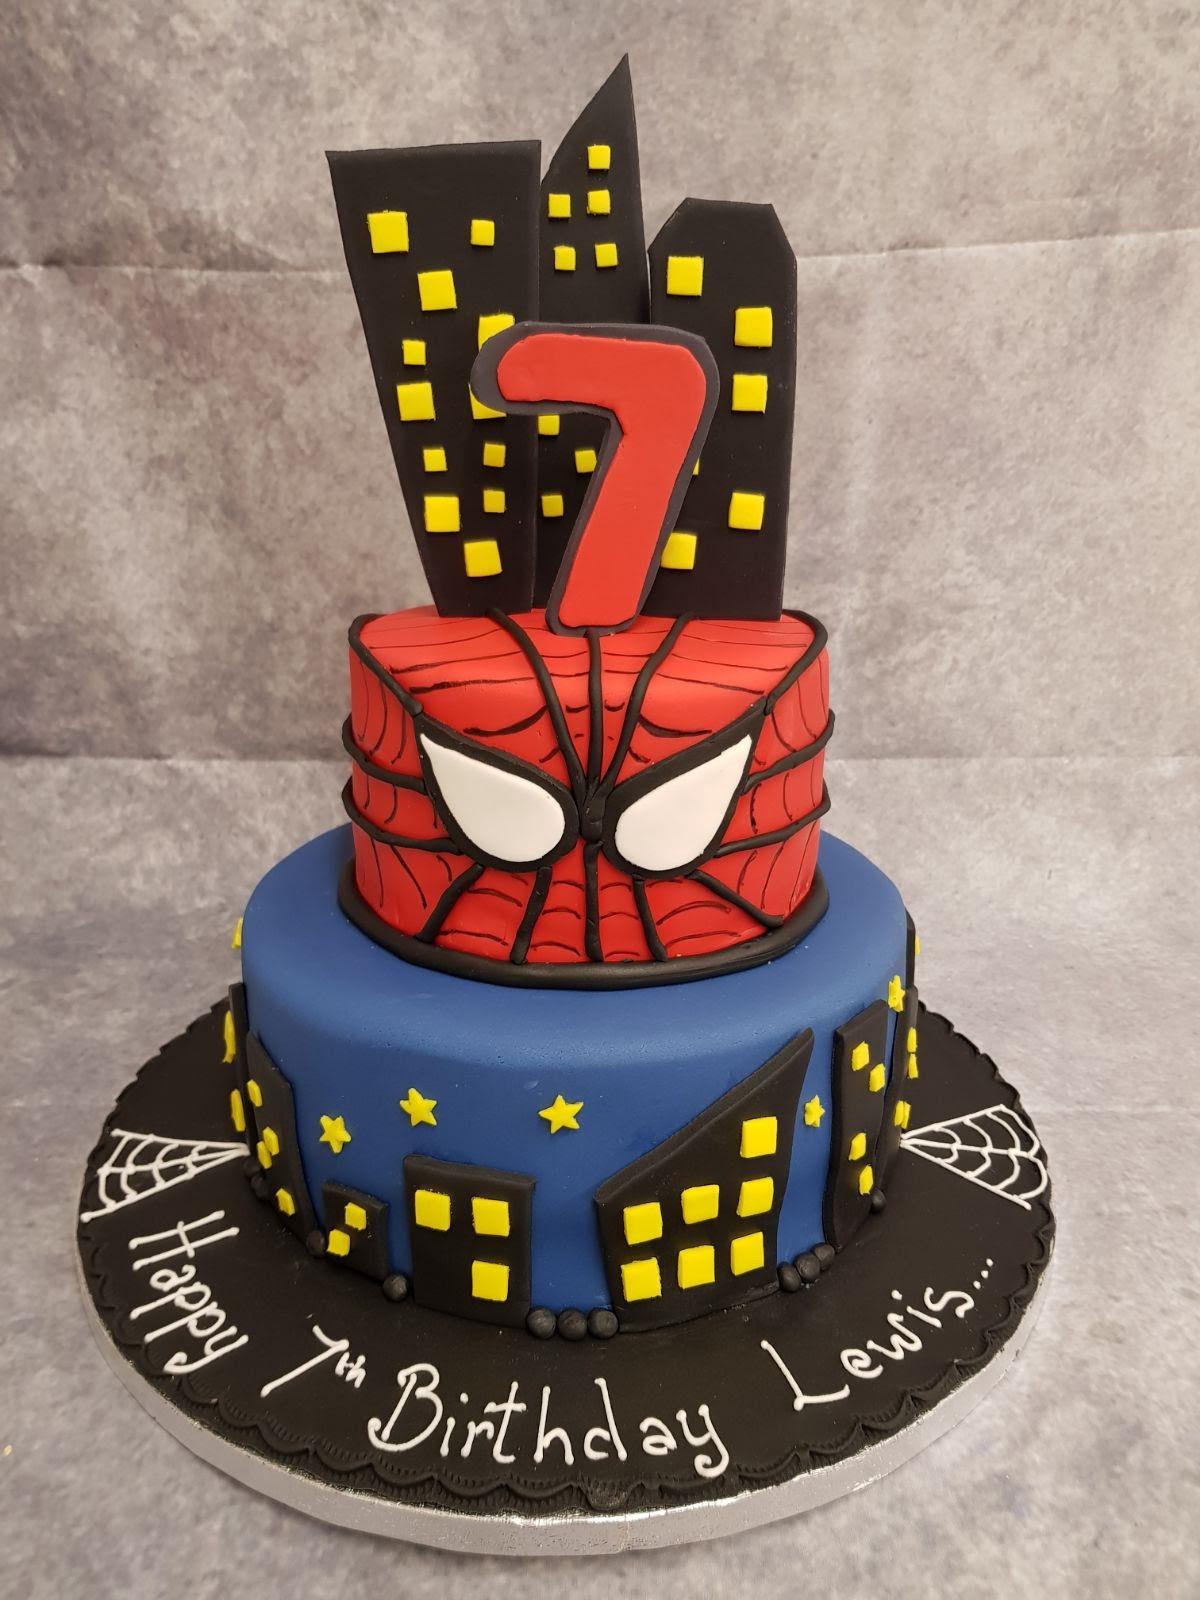 CC037 2 Tier Spider-man Theme Cake - Ravens Bakery of ...